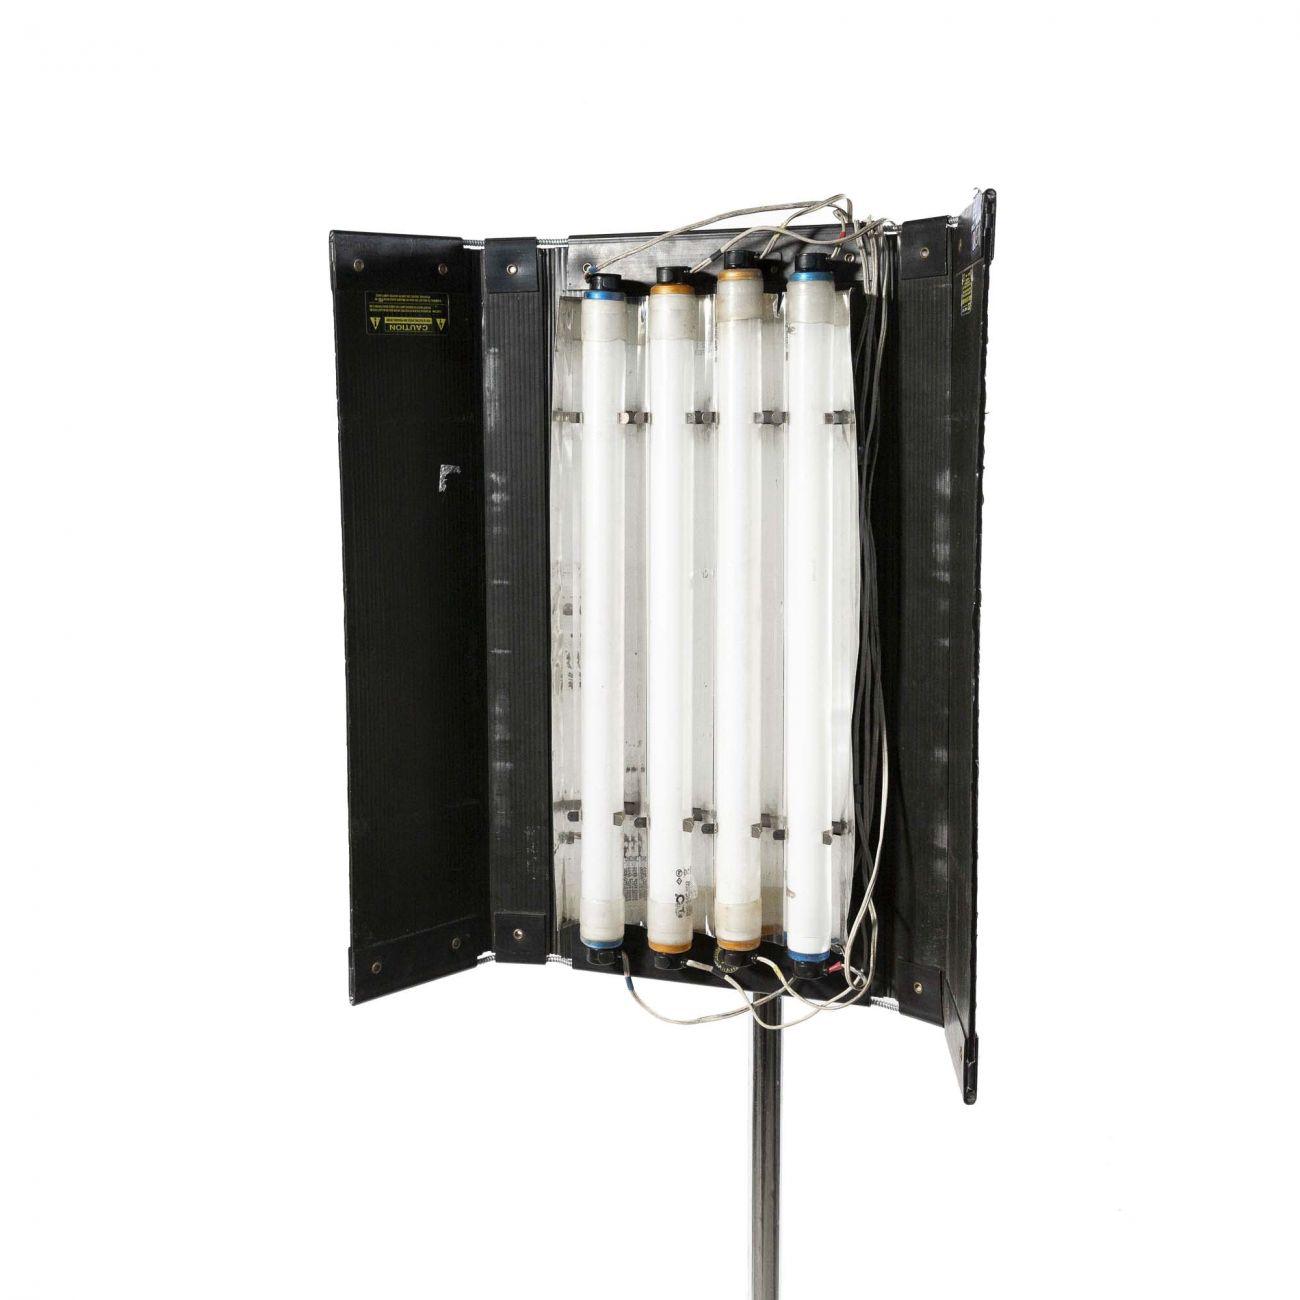 KinoFlo 2ft x 4 lamps